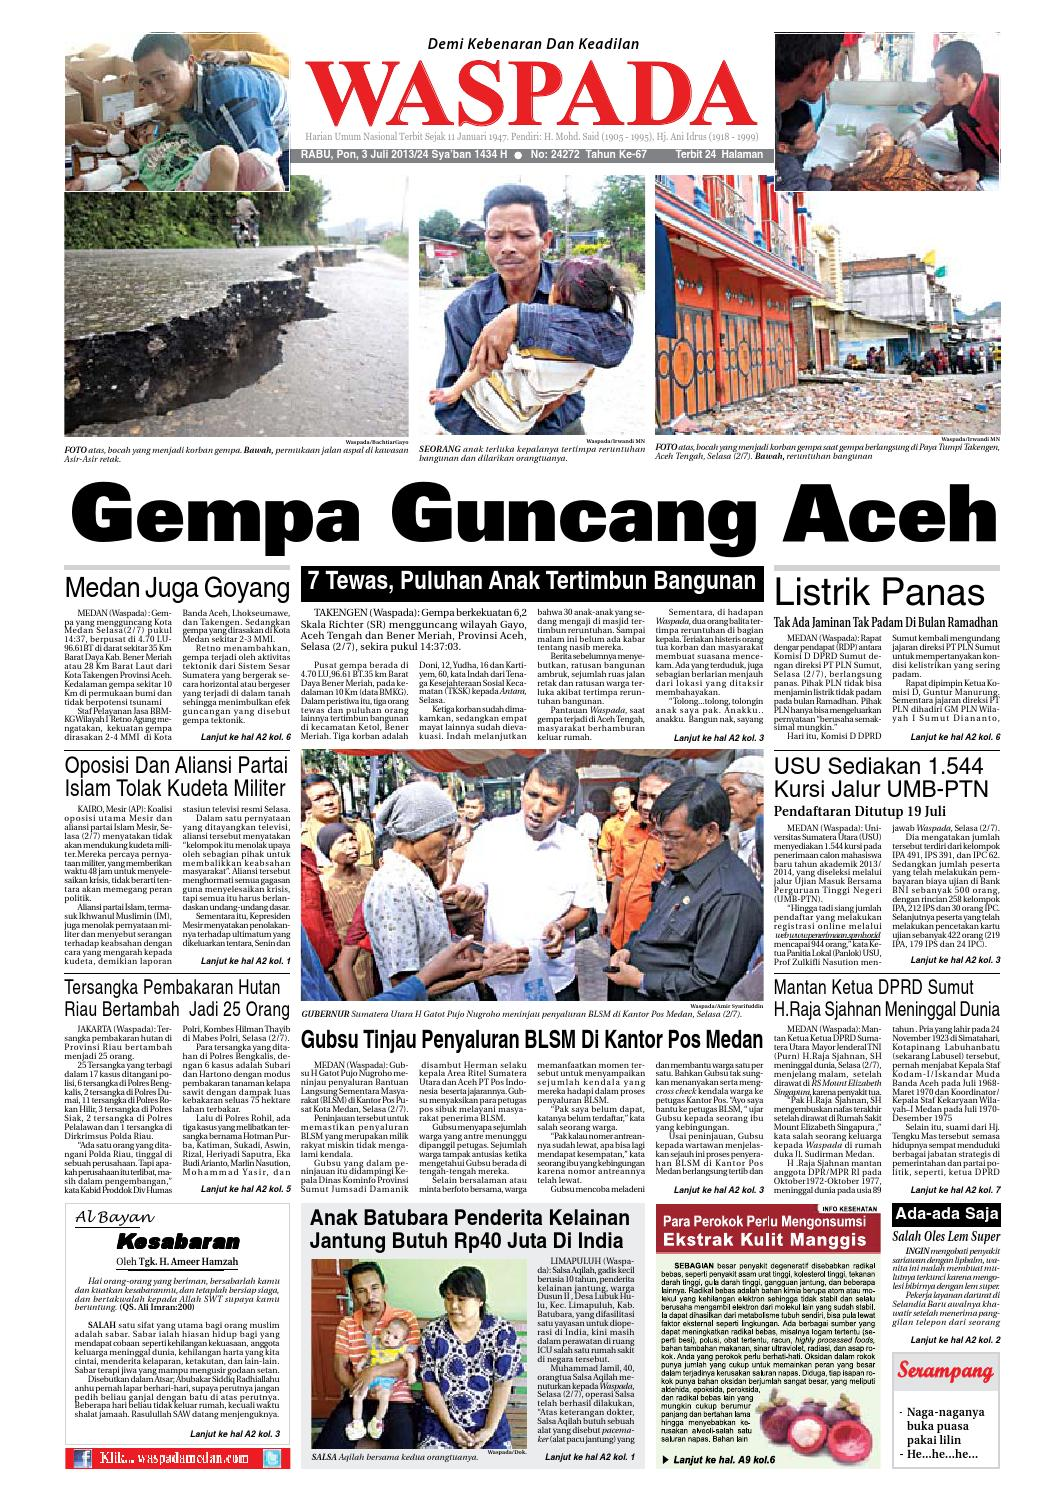 Waspada Rabu 3 Juli 2013 By Harian Issuu Produk Umkm Bumn Bolu Gulung Hj Enong